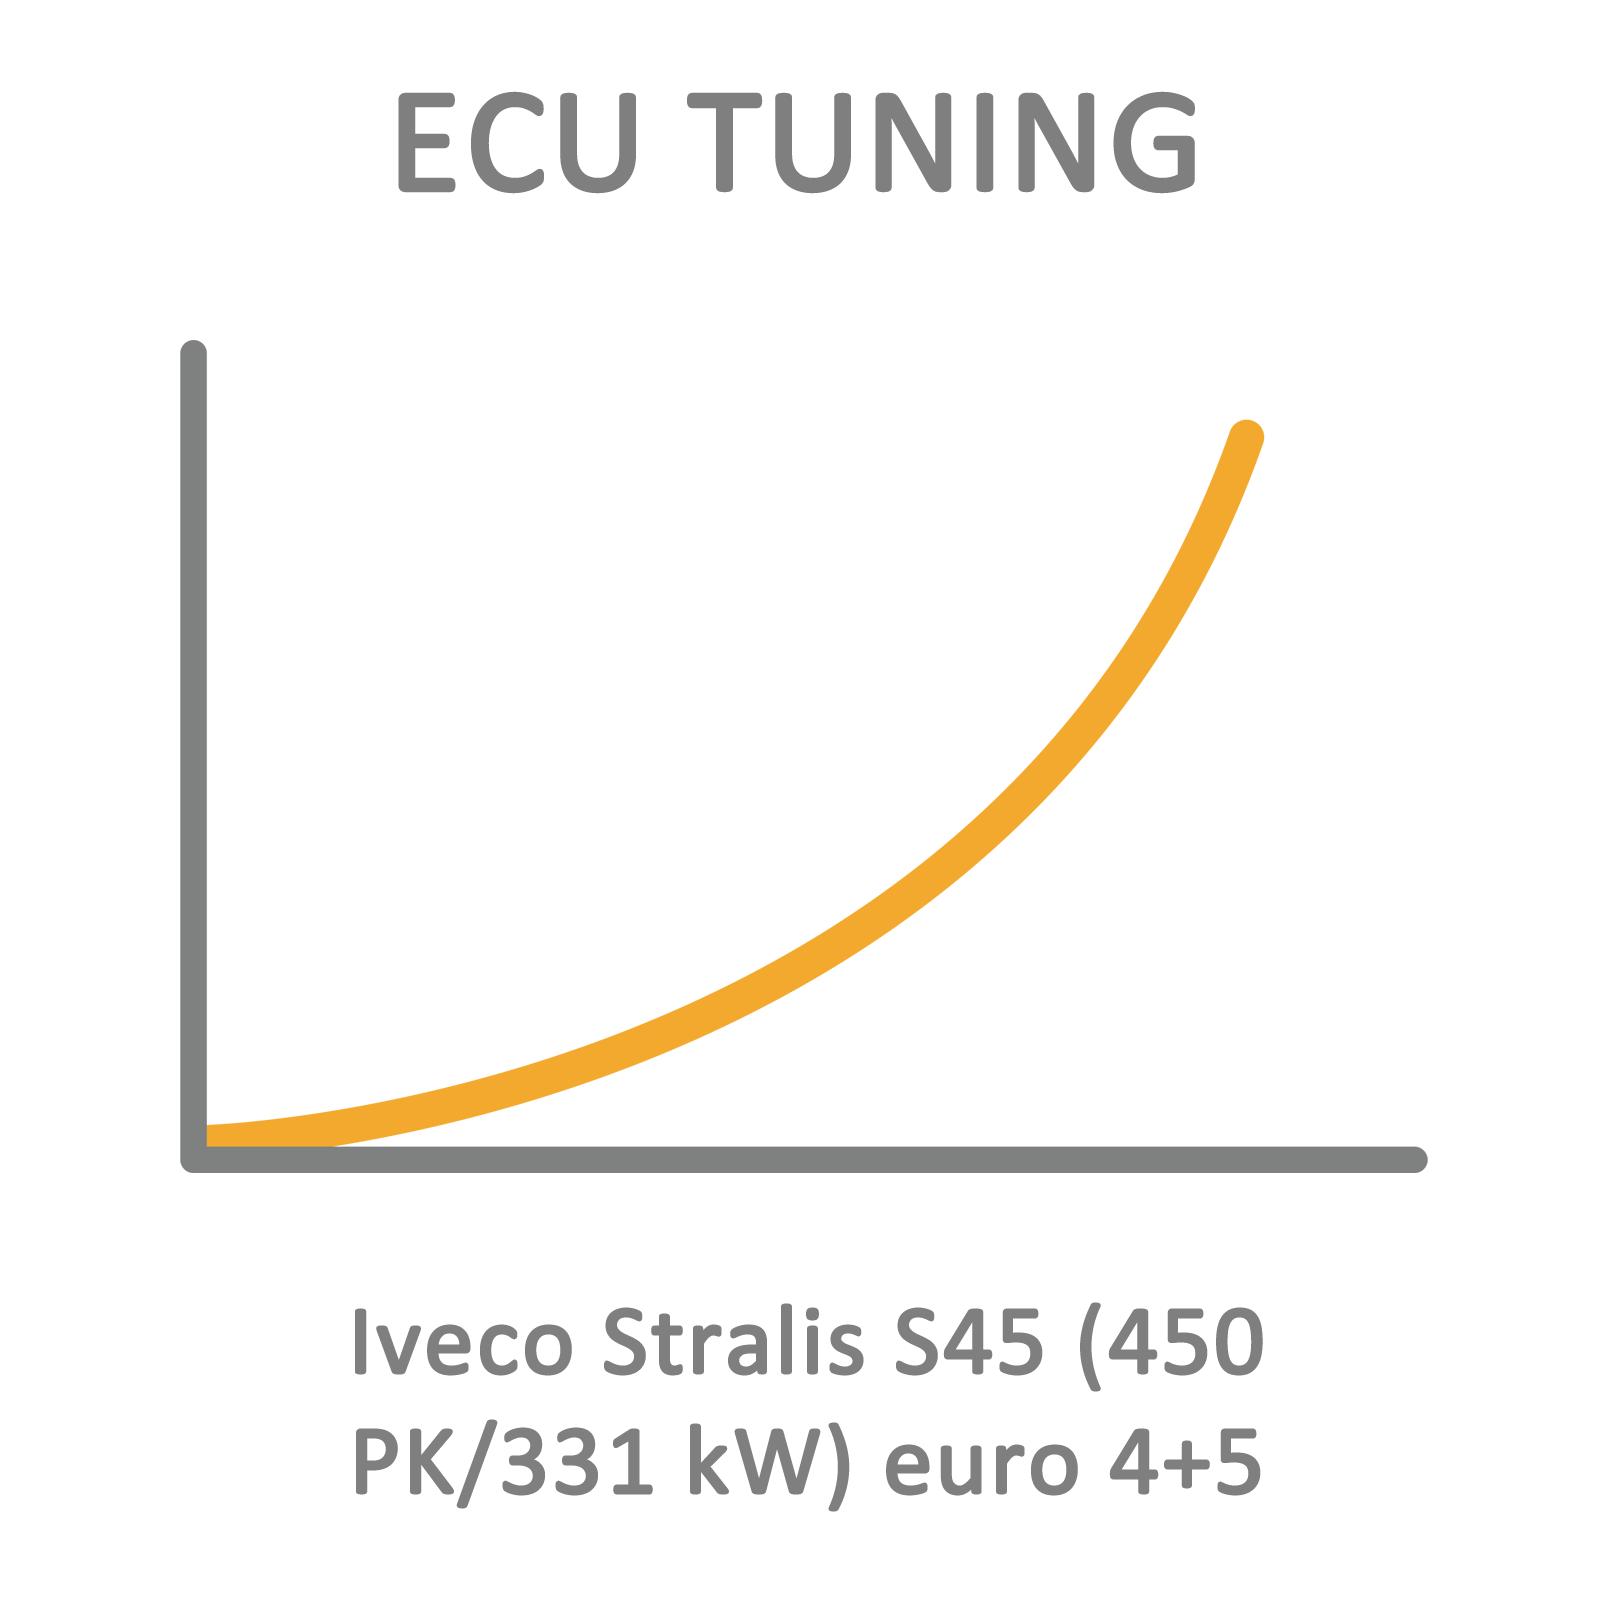 Iveco Stralis S45 (450 PK/331 kW) euro 4+5 ECU Tuning